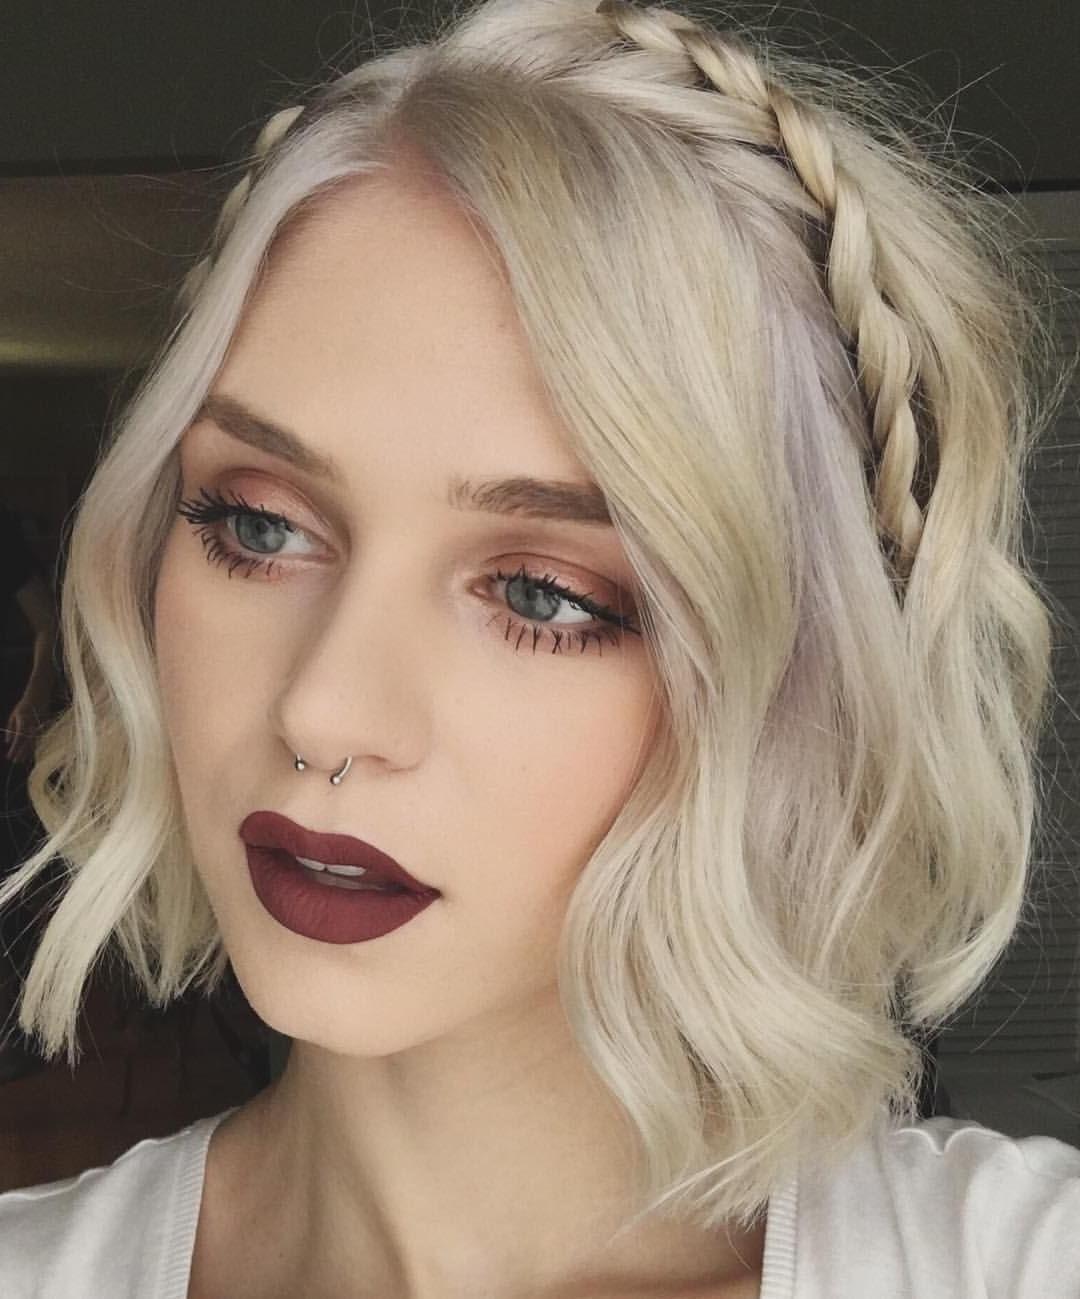 Consulta Esta Foto De Instagram De @fernxallysa • 2,345 Me Gusta Inside Best And Newest Wedding Hairstyles For Short Blonde Hair (View 15 of 15)